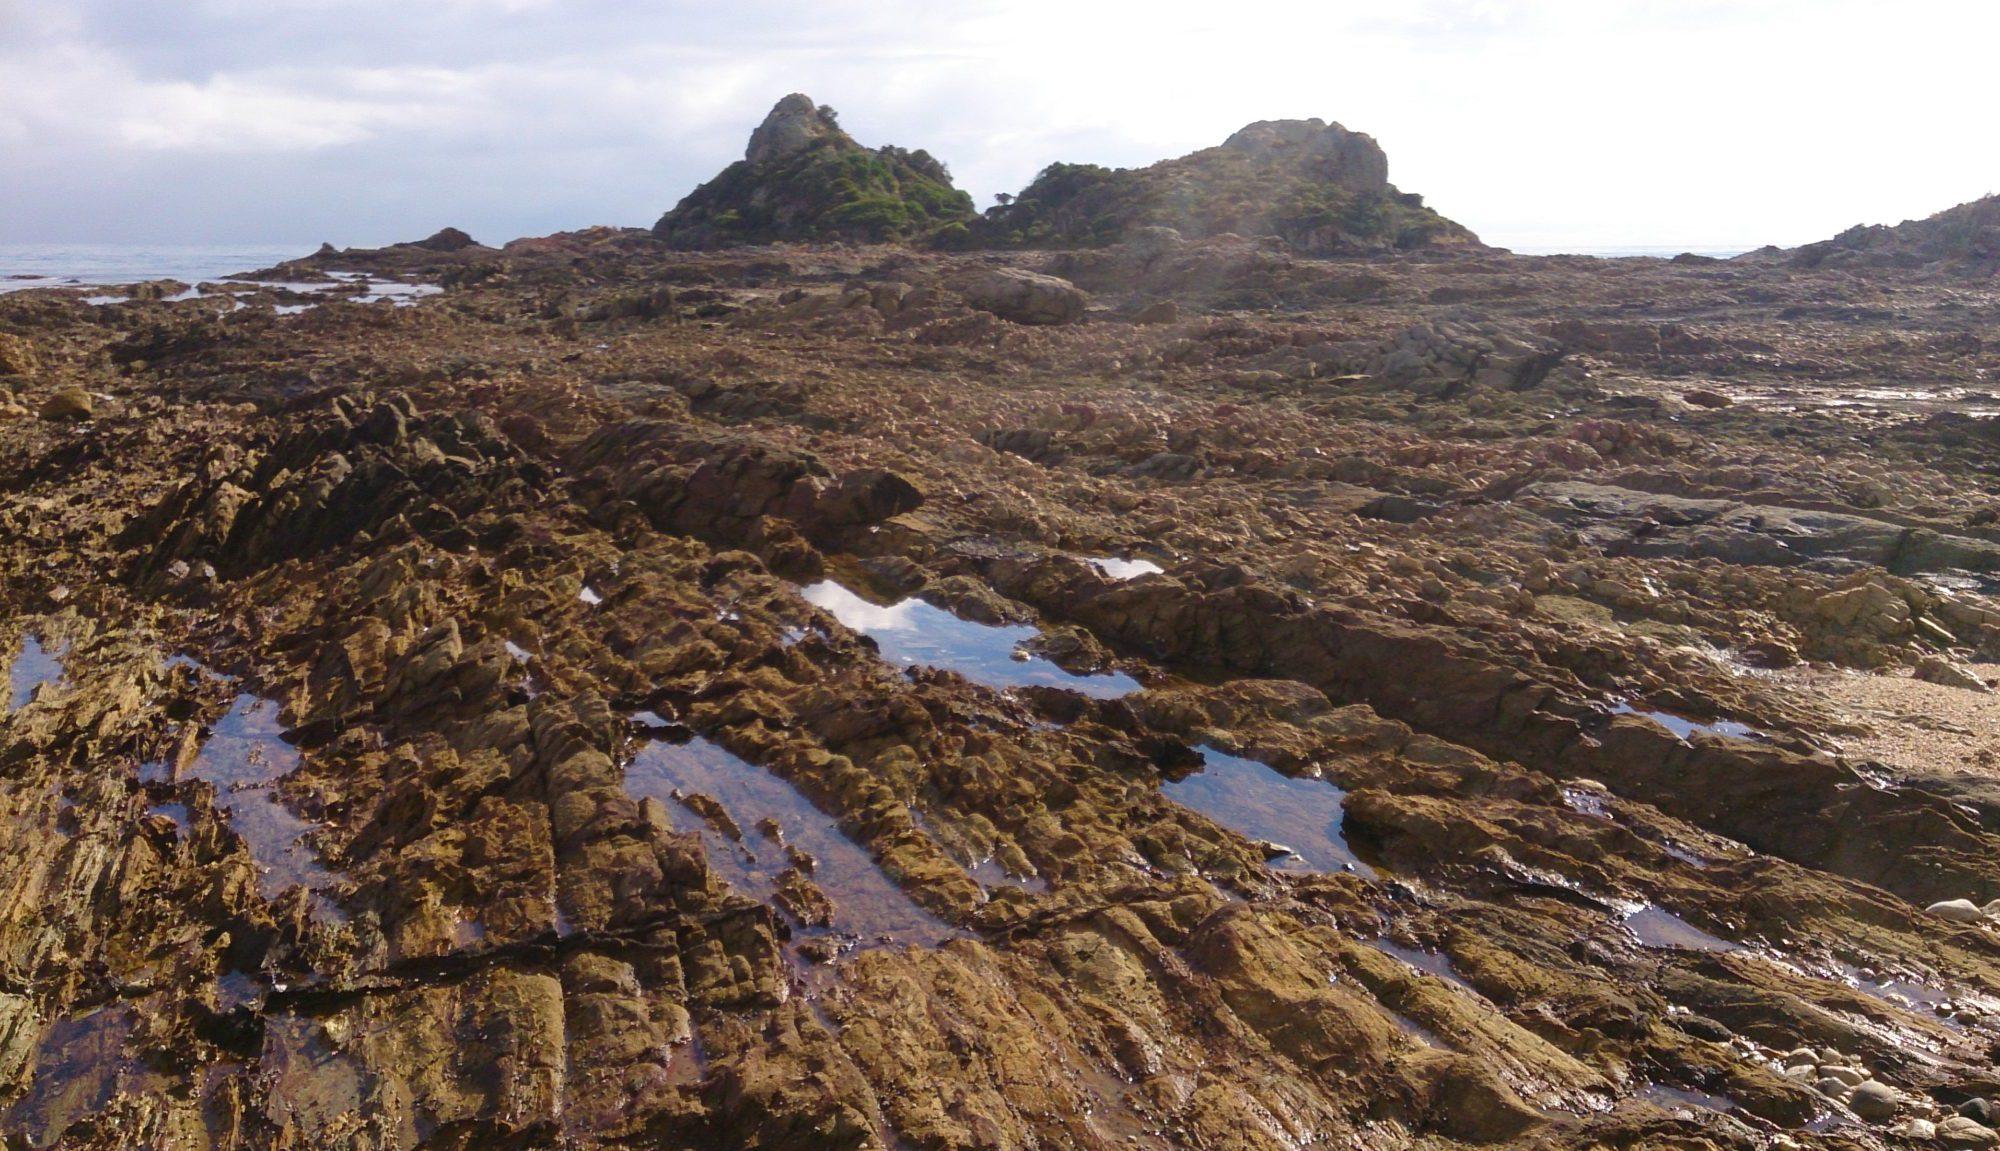 Traversing Goat Island